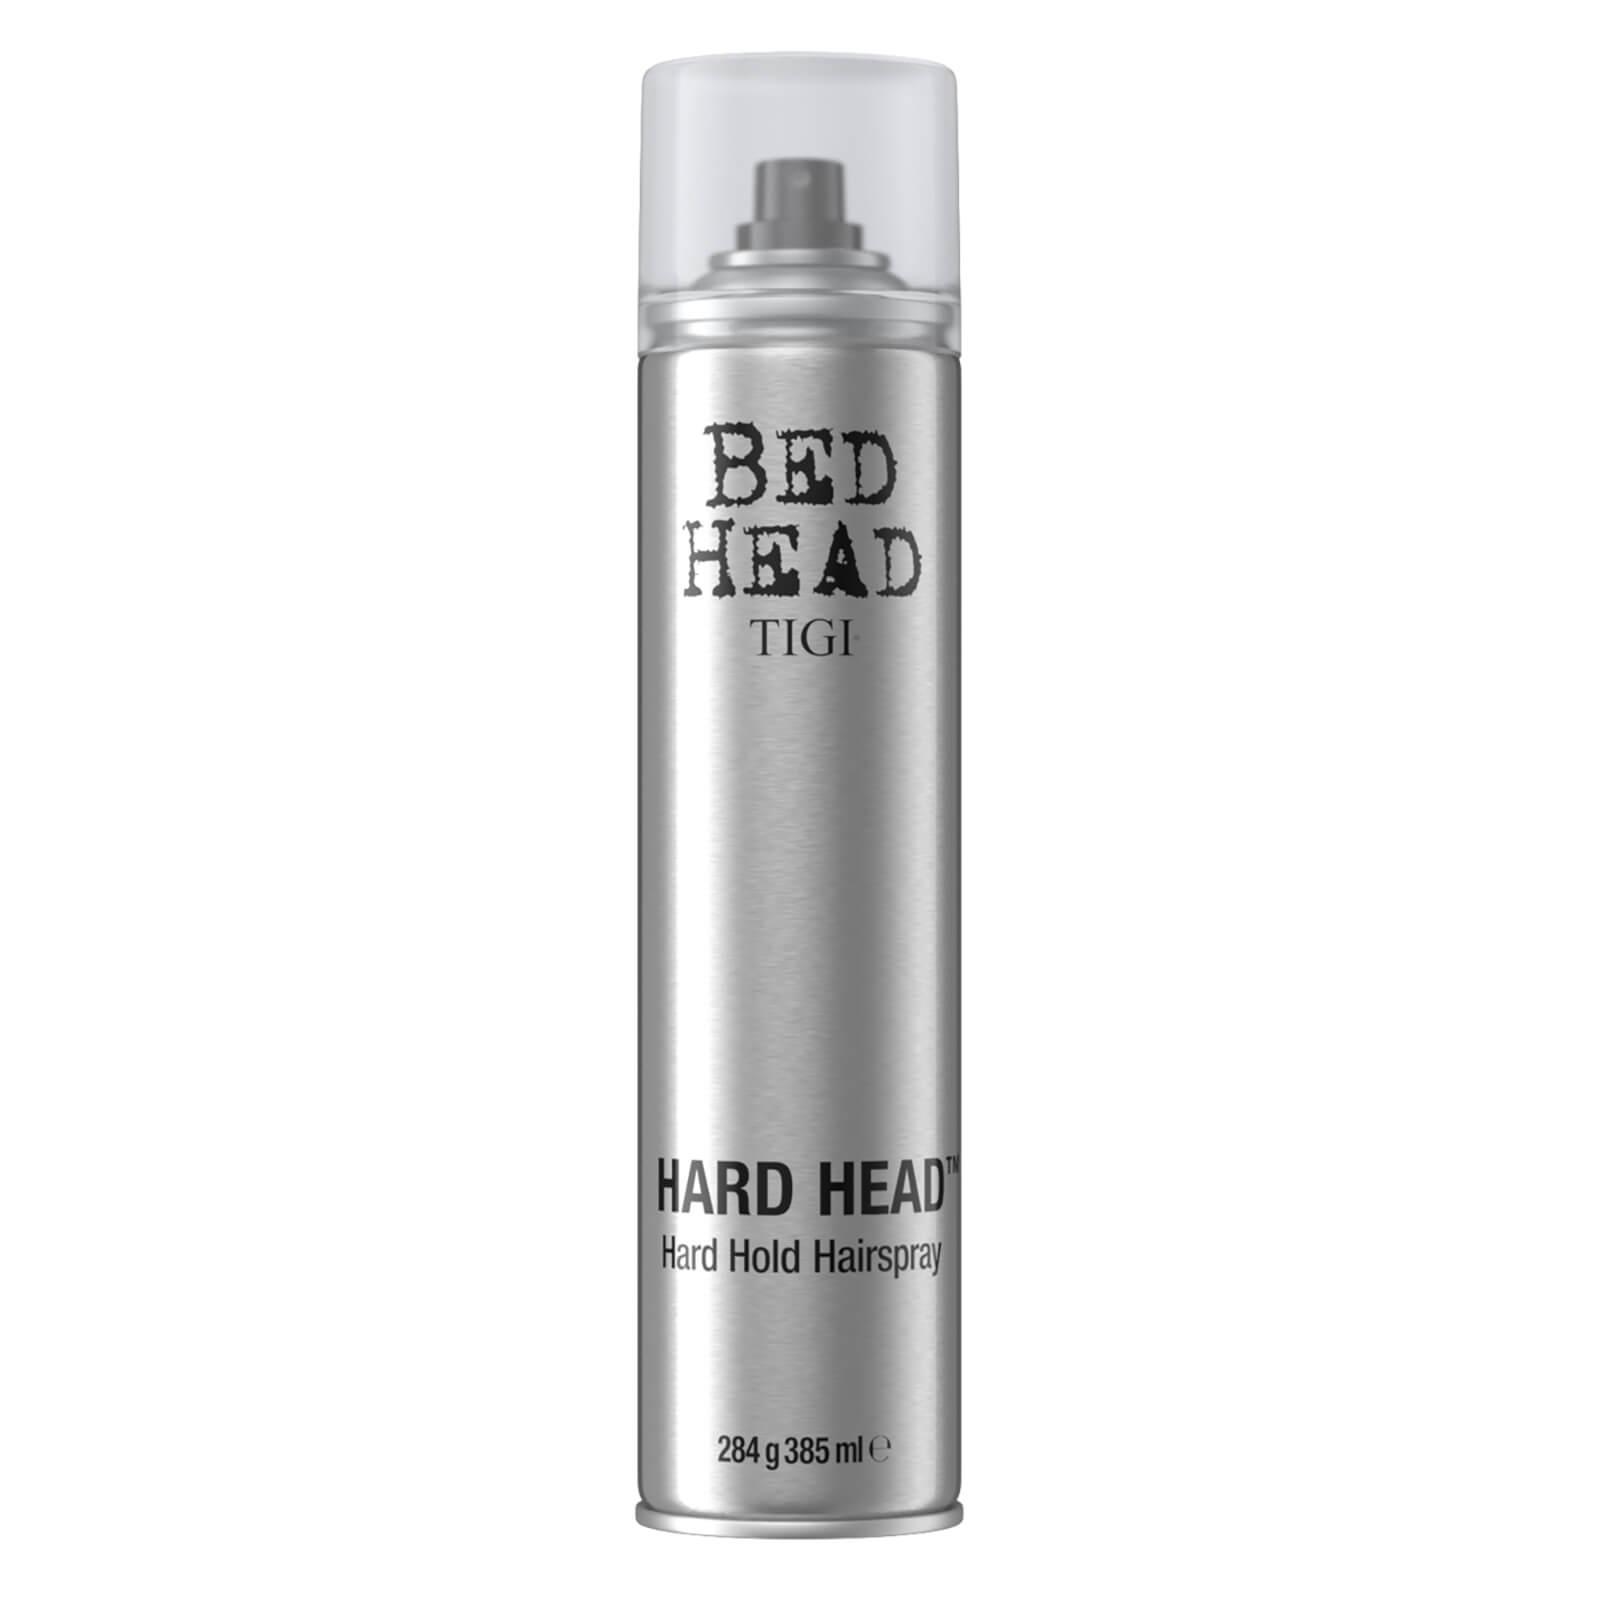 TIGI Bed Head Hard Head Hairspray Best Hair Spray In Pakistan